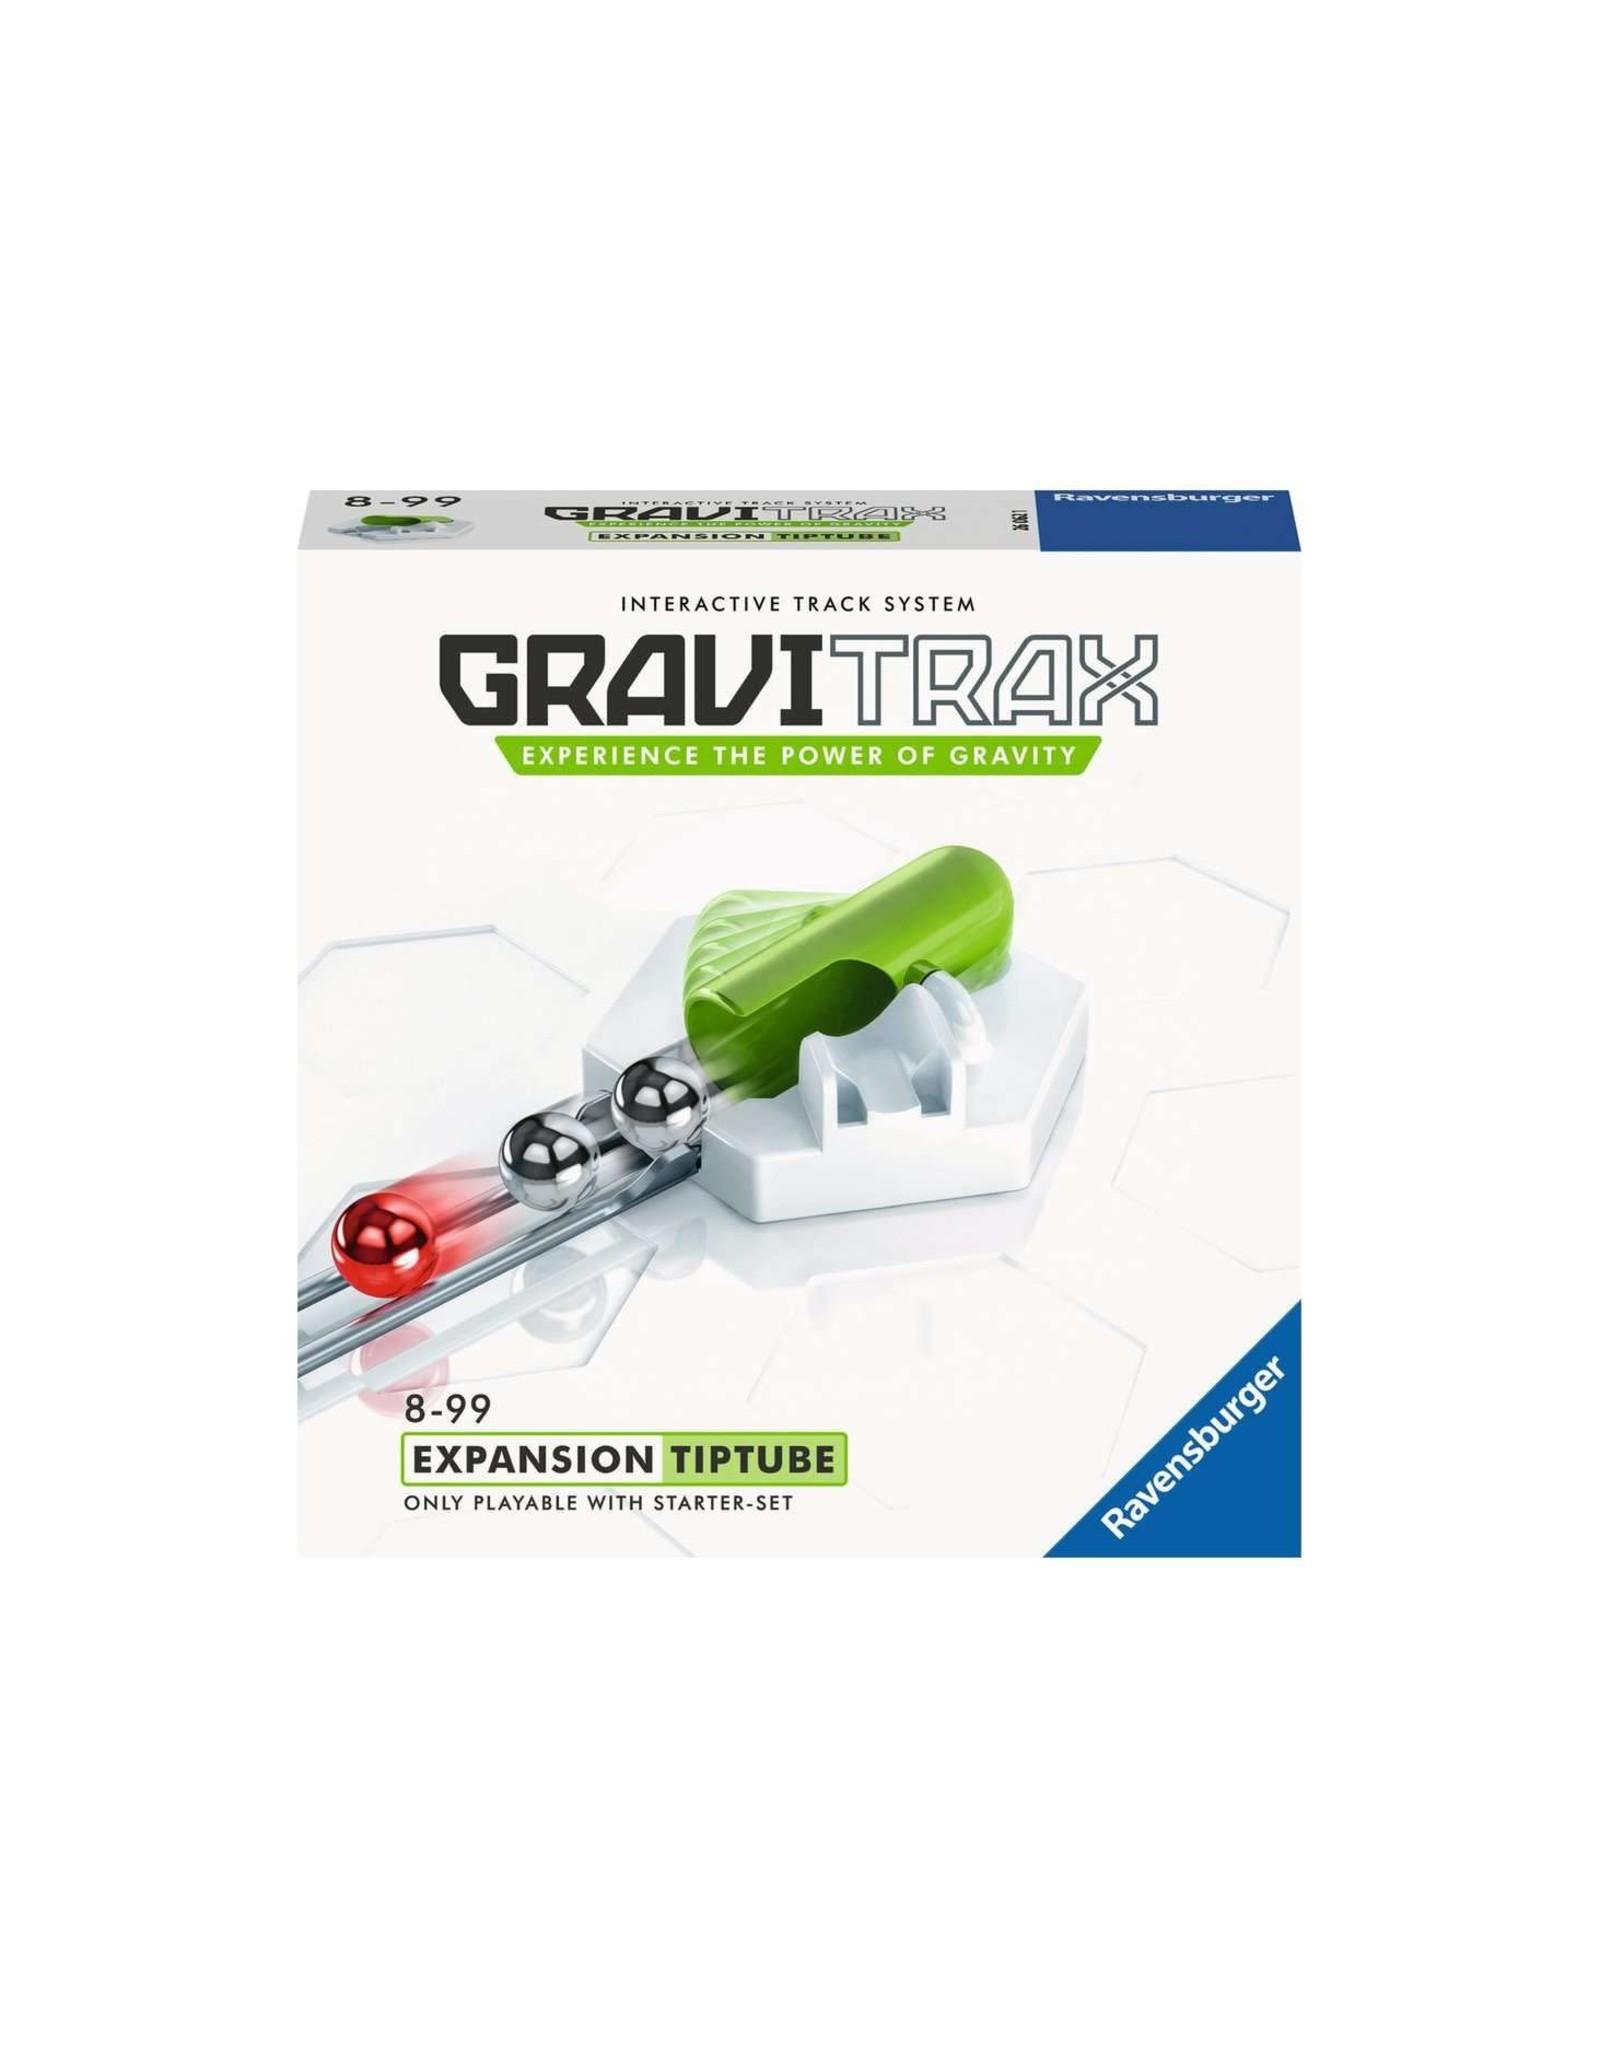 Gravitrax Accessory: Tip Tube